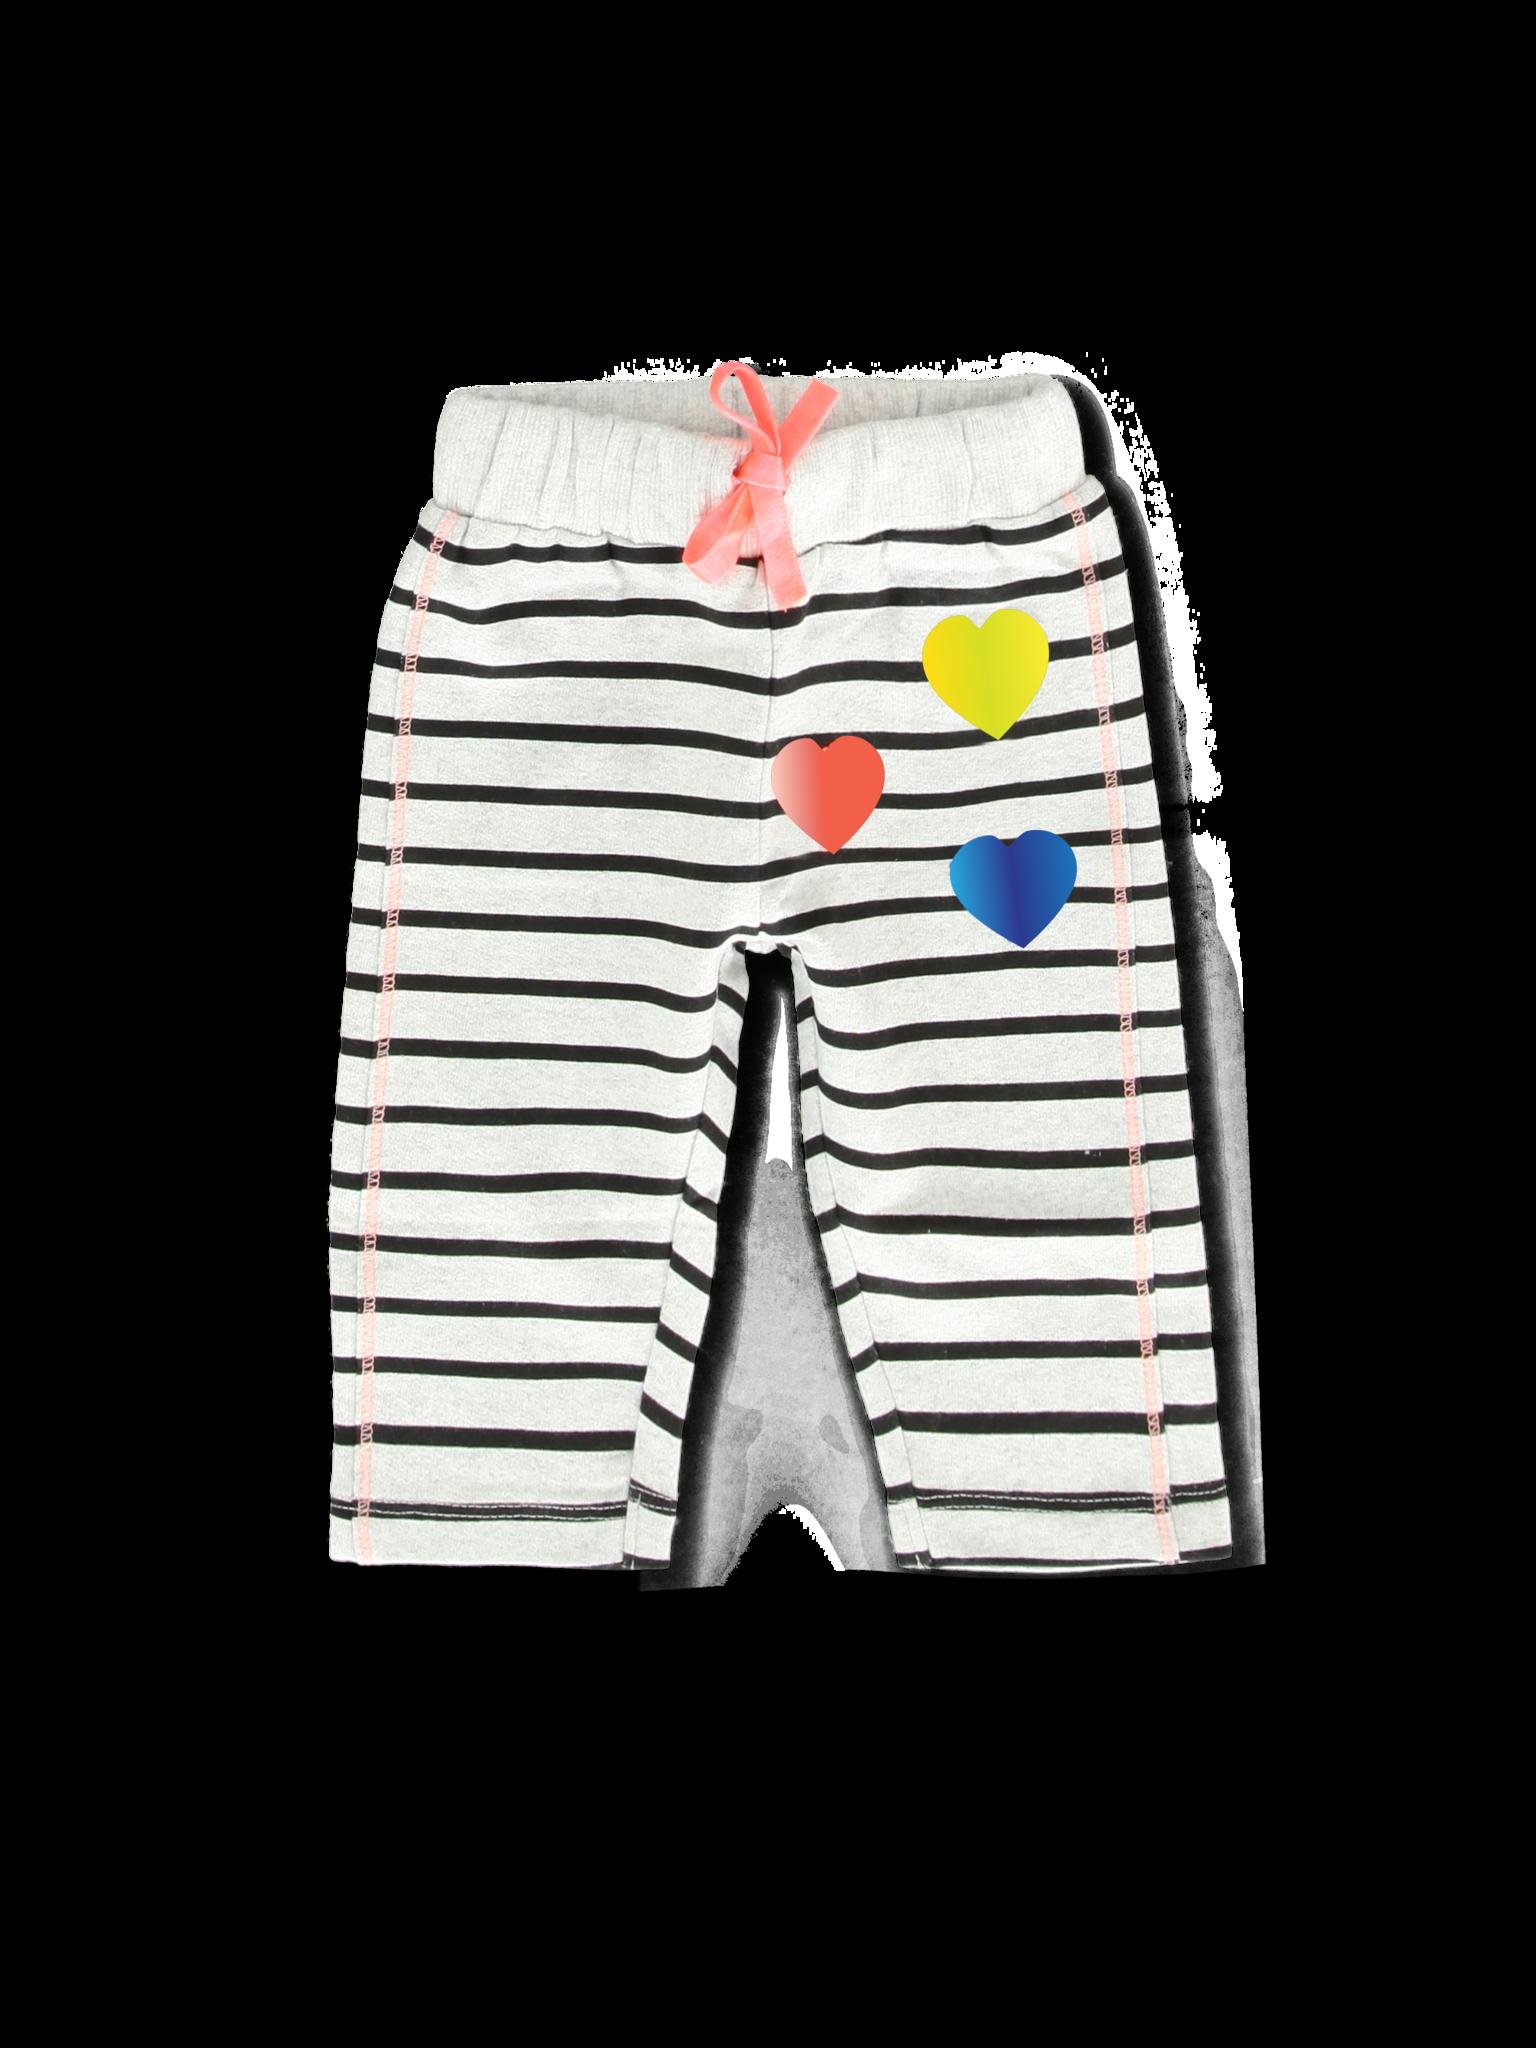 Lemon Beret | Winter 2019 Baby | Jogging Pant | 8 pcs/box